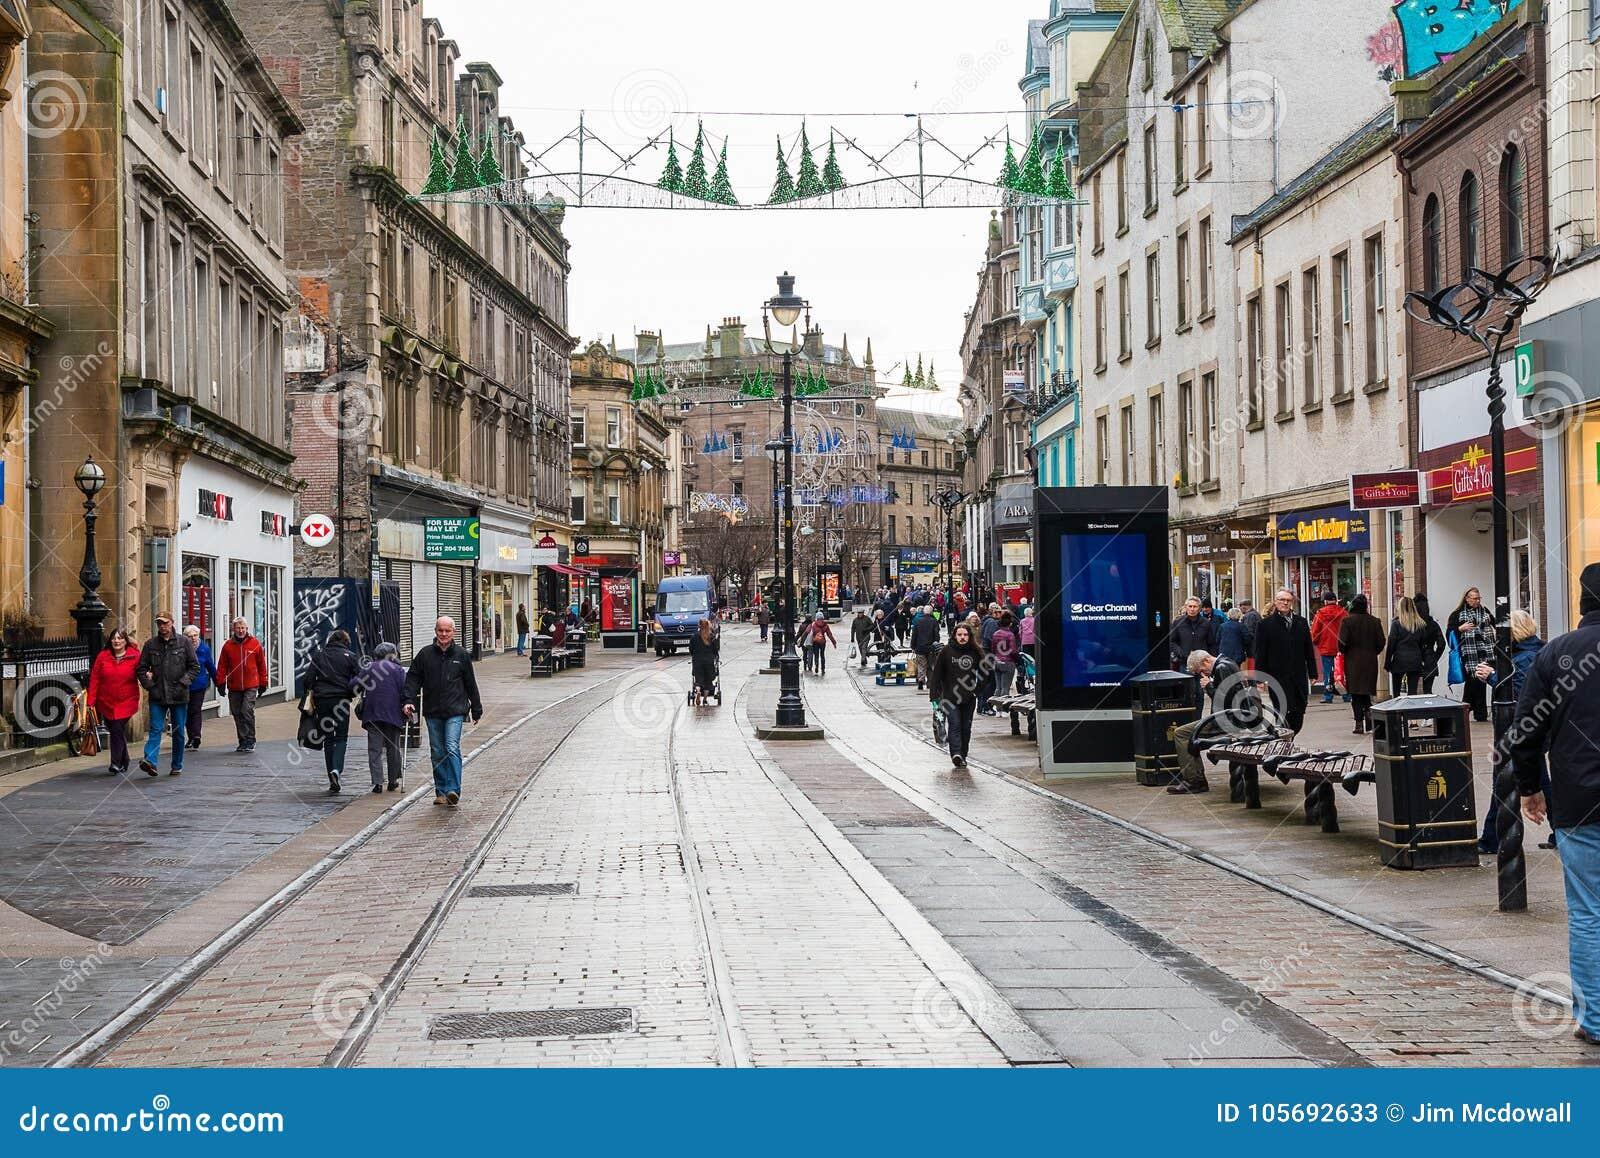 Shopping Centre Dundee City Editorial Stock Photo - Image of bridge ...